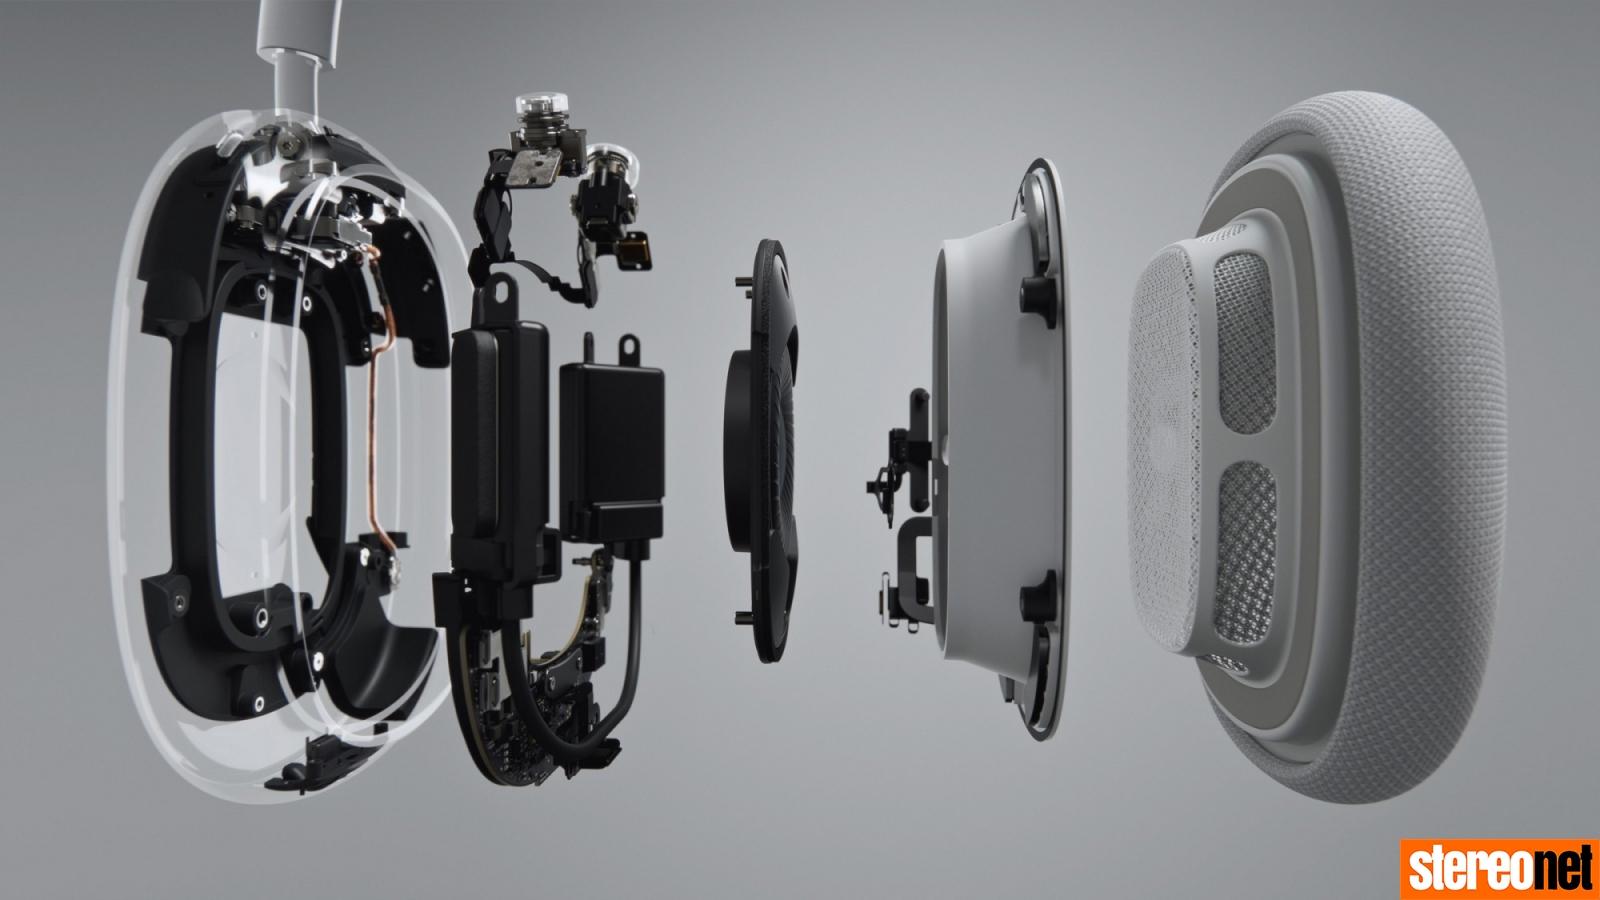 Apple AirPods Max headphones